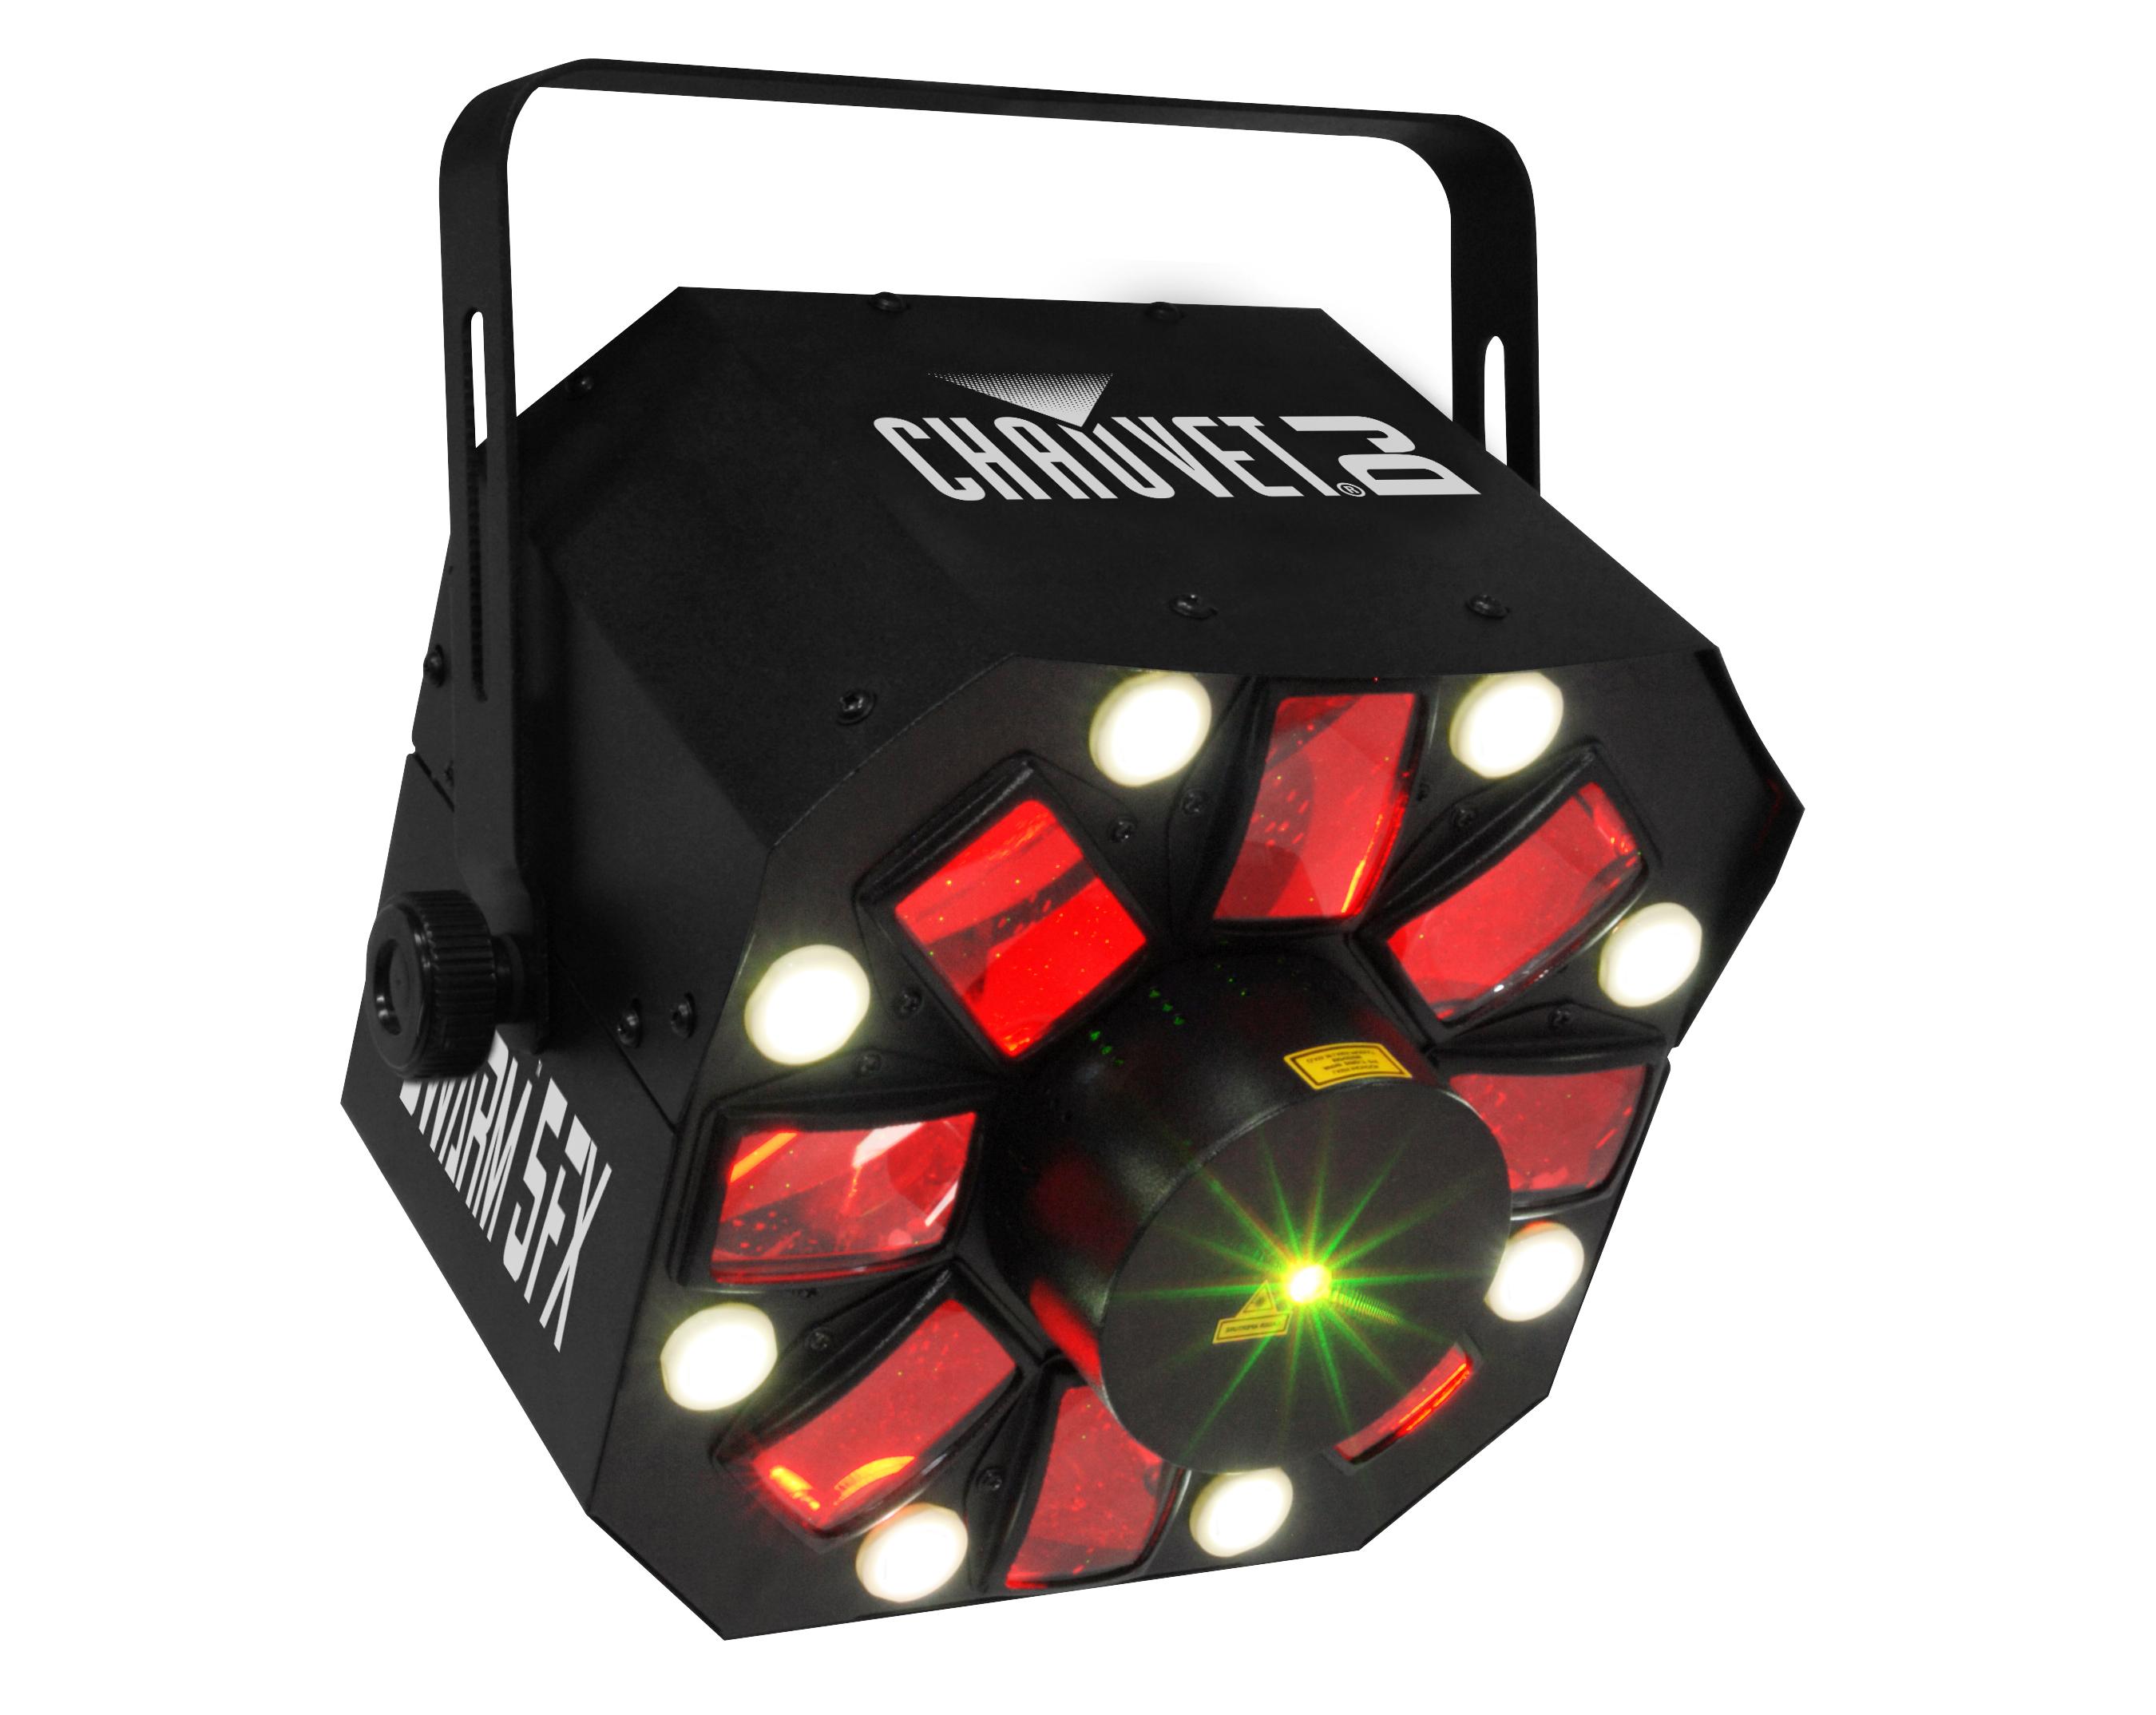 lighting premium controller numark channel avshop american dj equipment ca controllers light